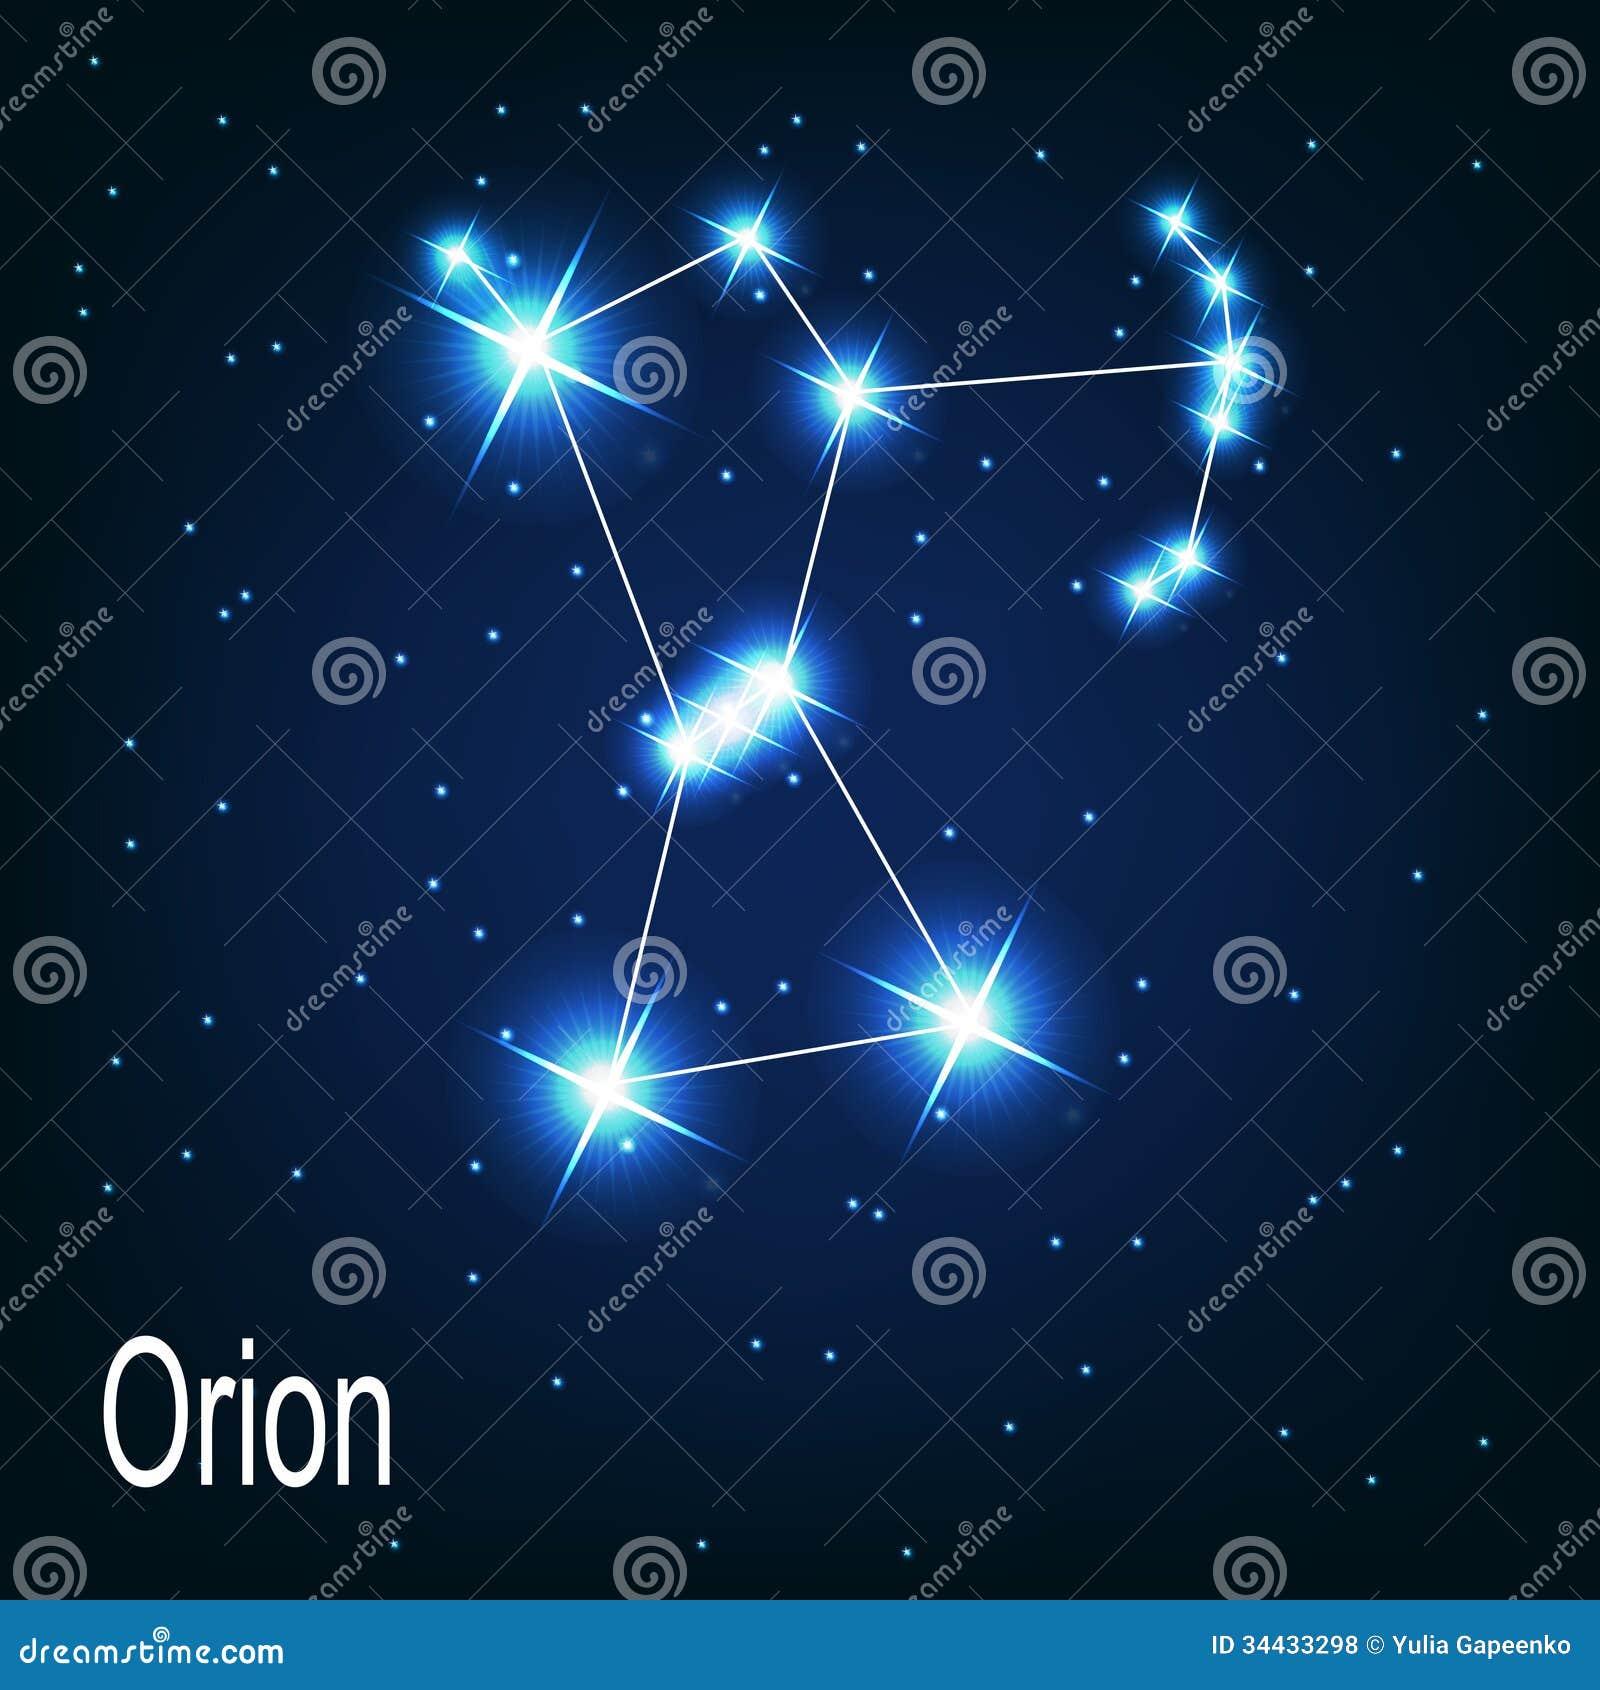 WINTER orion | star constellations | Pinterest | Winter